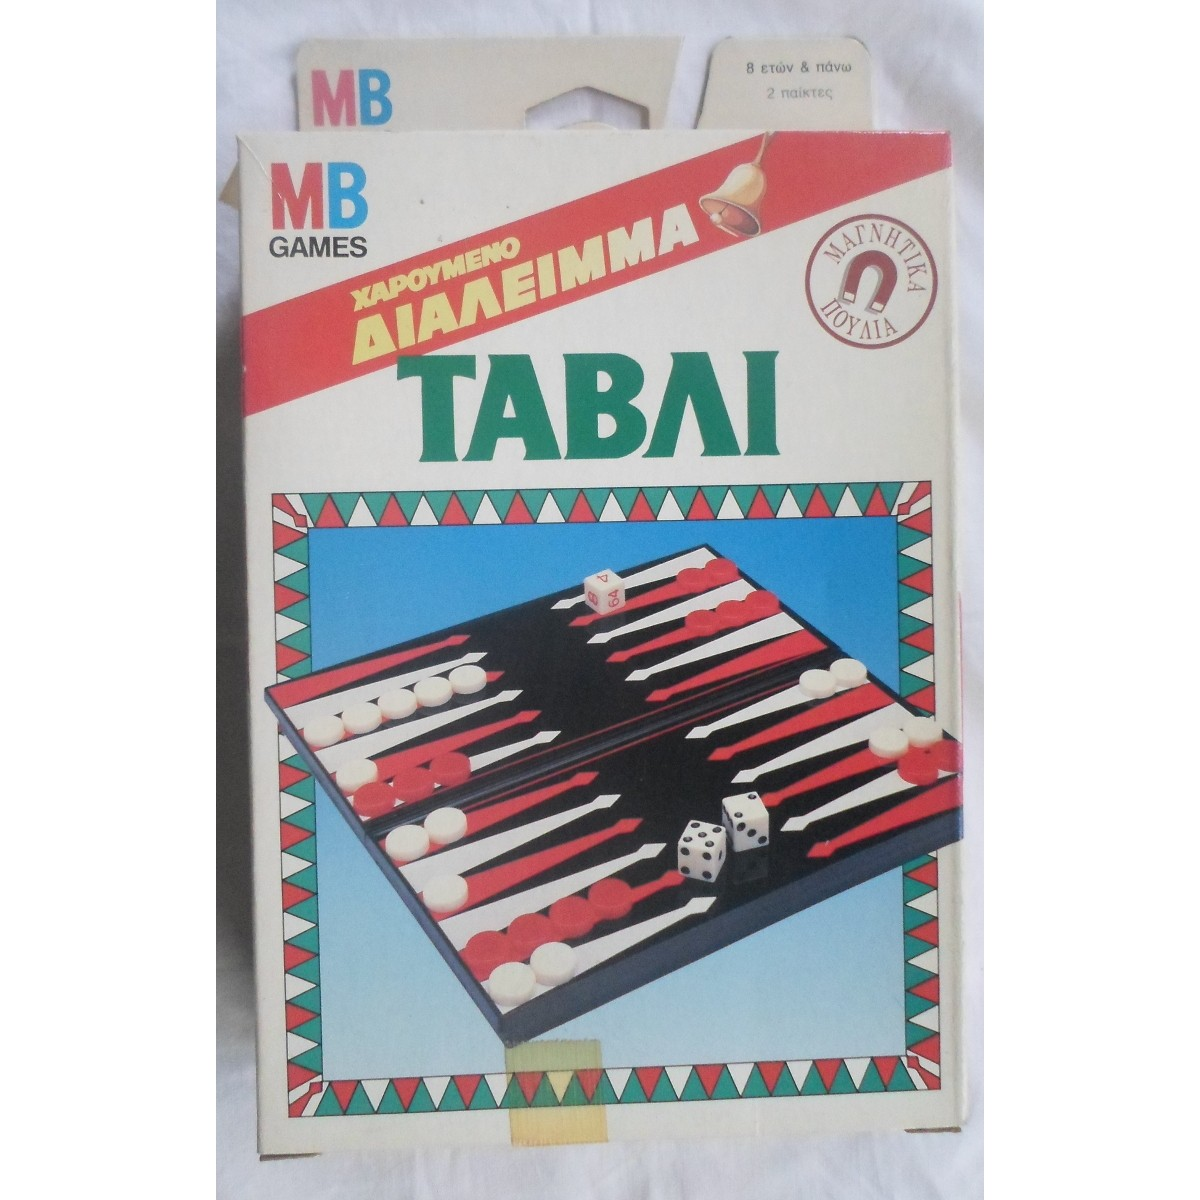 MB elgreco GAMES , ΤΑΒΛΙ, Hasbro 1991.